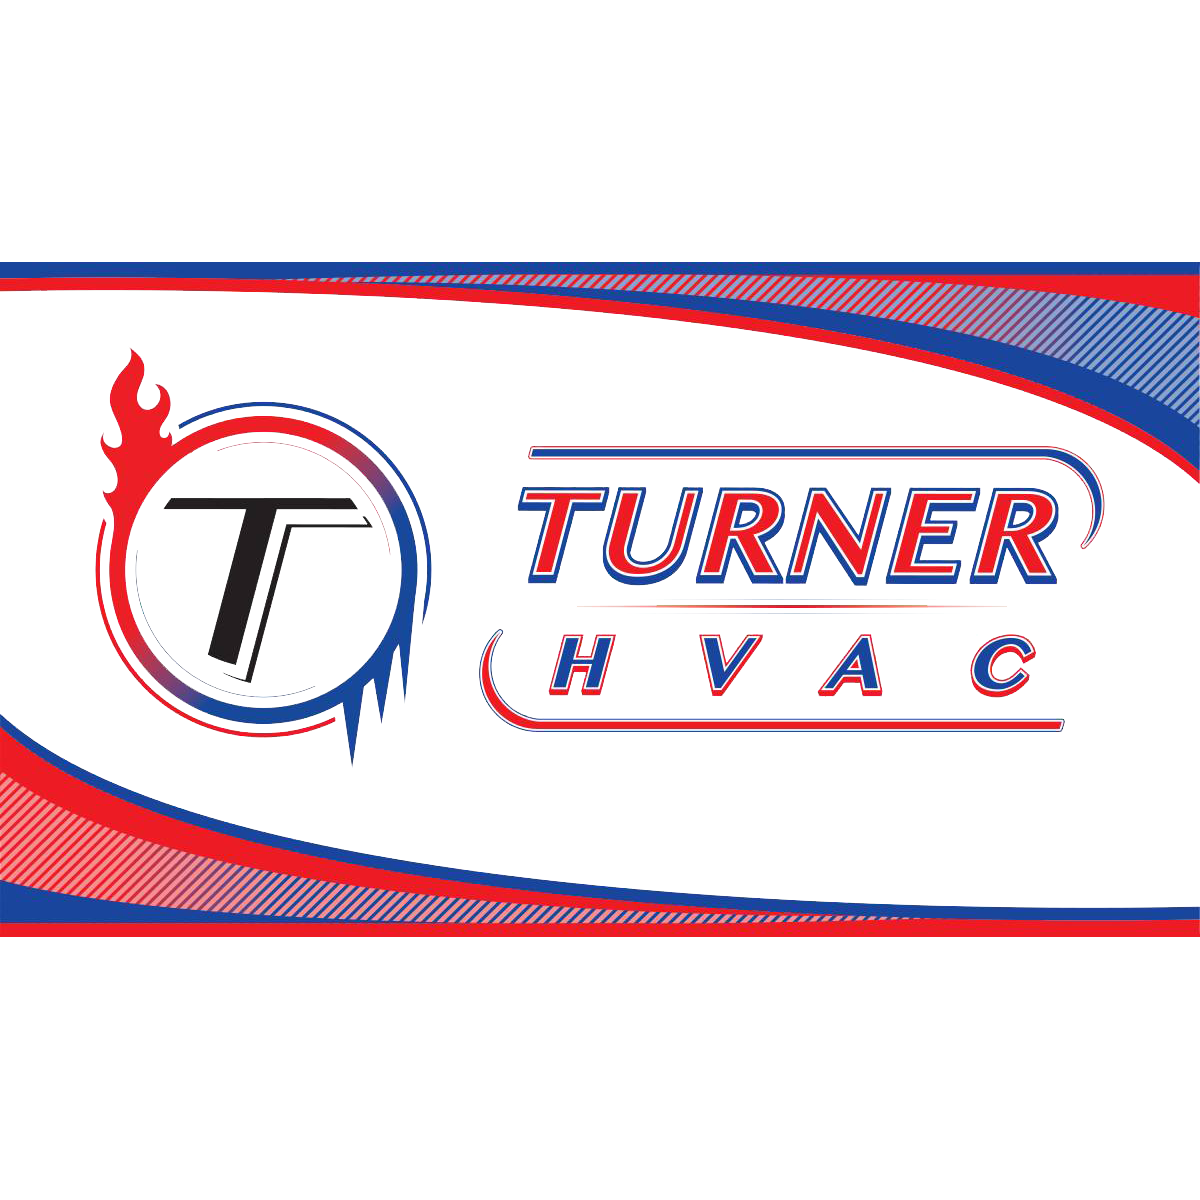 Turner HVAC